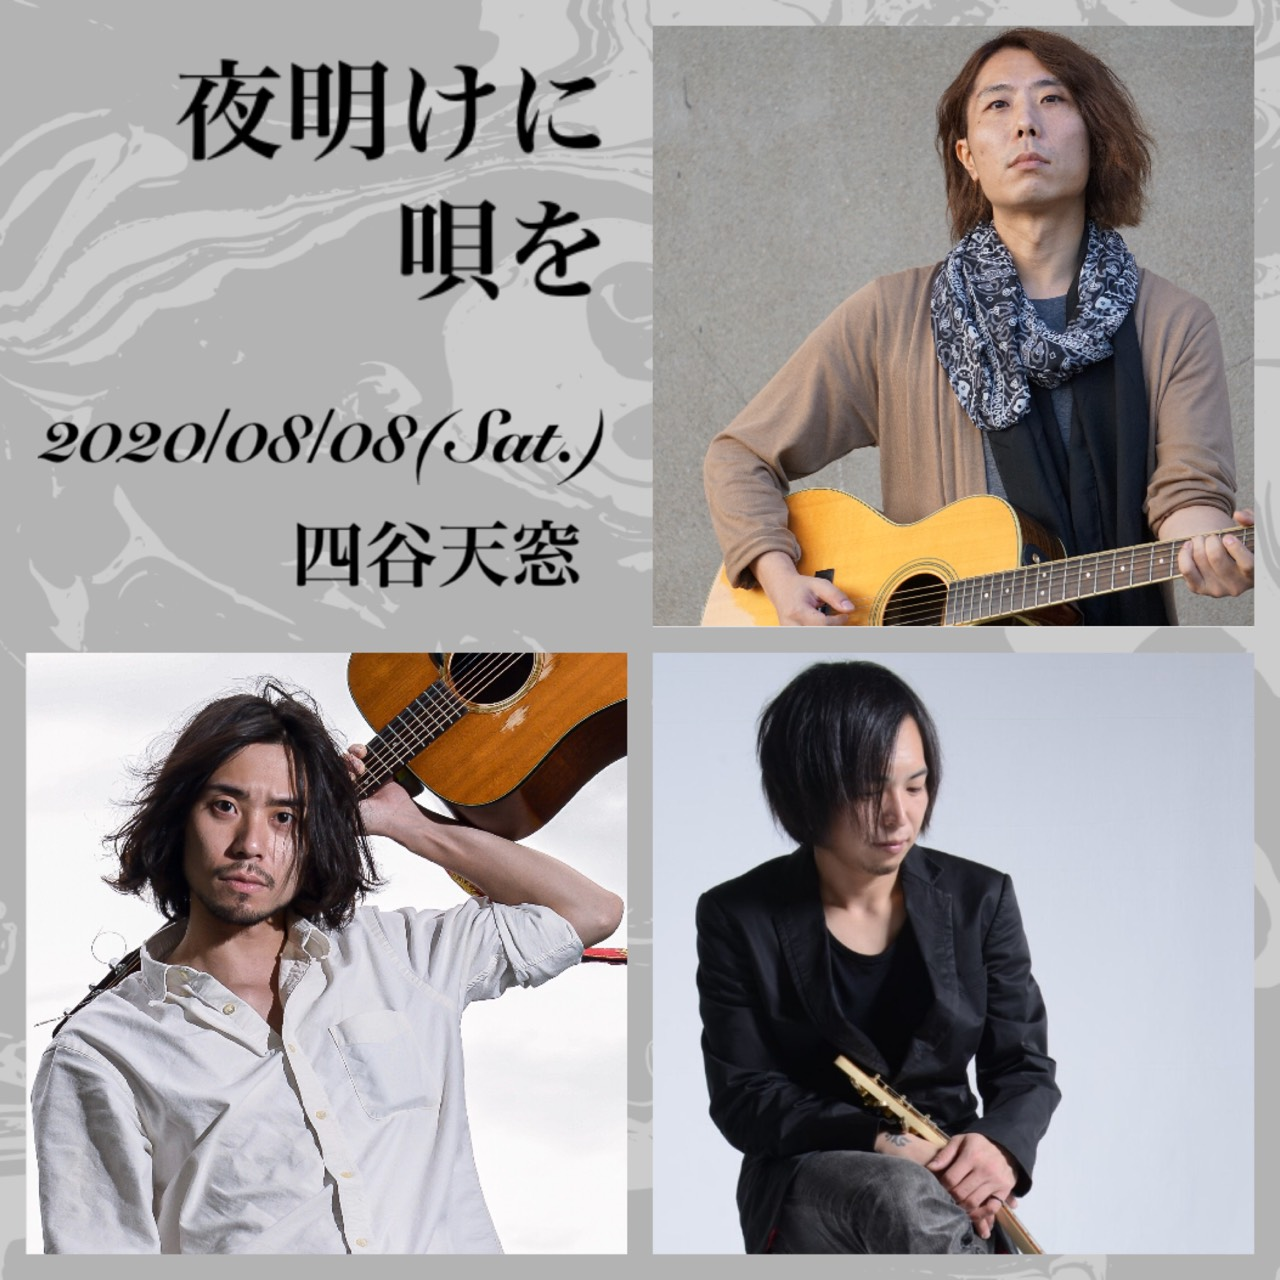 【SAVE TENMADO】 鳥居勇介presents「夜明けに唄を」